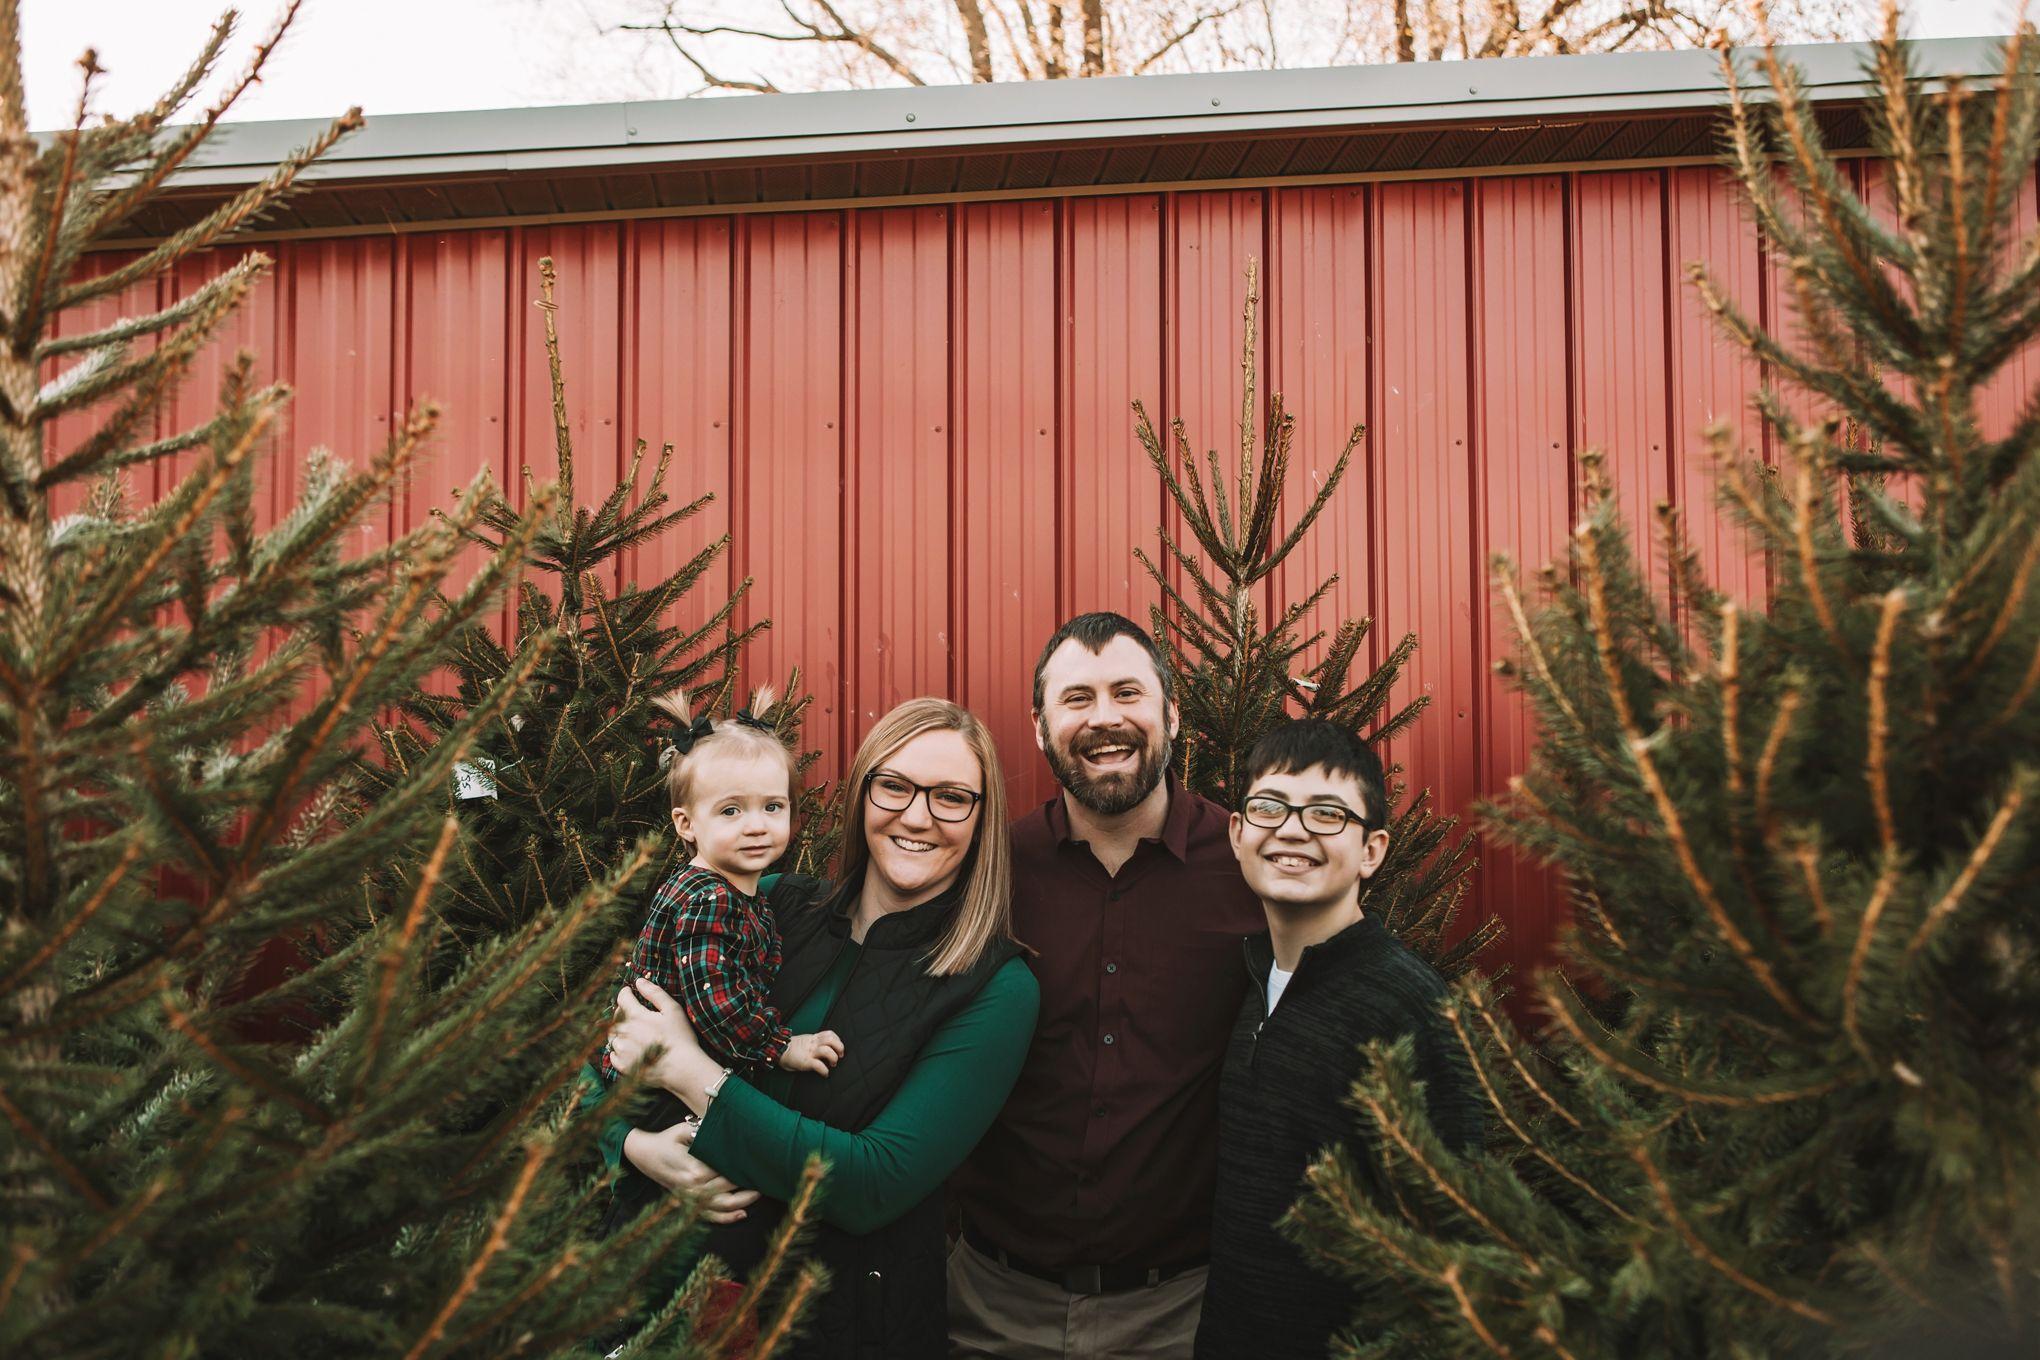 The Walls Family Cincinnati Christmas Mini Session Kristin Brown Photography In 2020 Christmas Mini Sessions Christmas Minis Mini Session